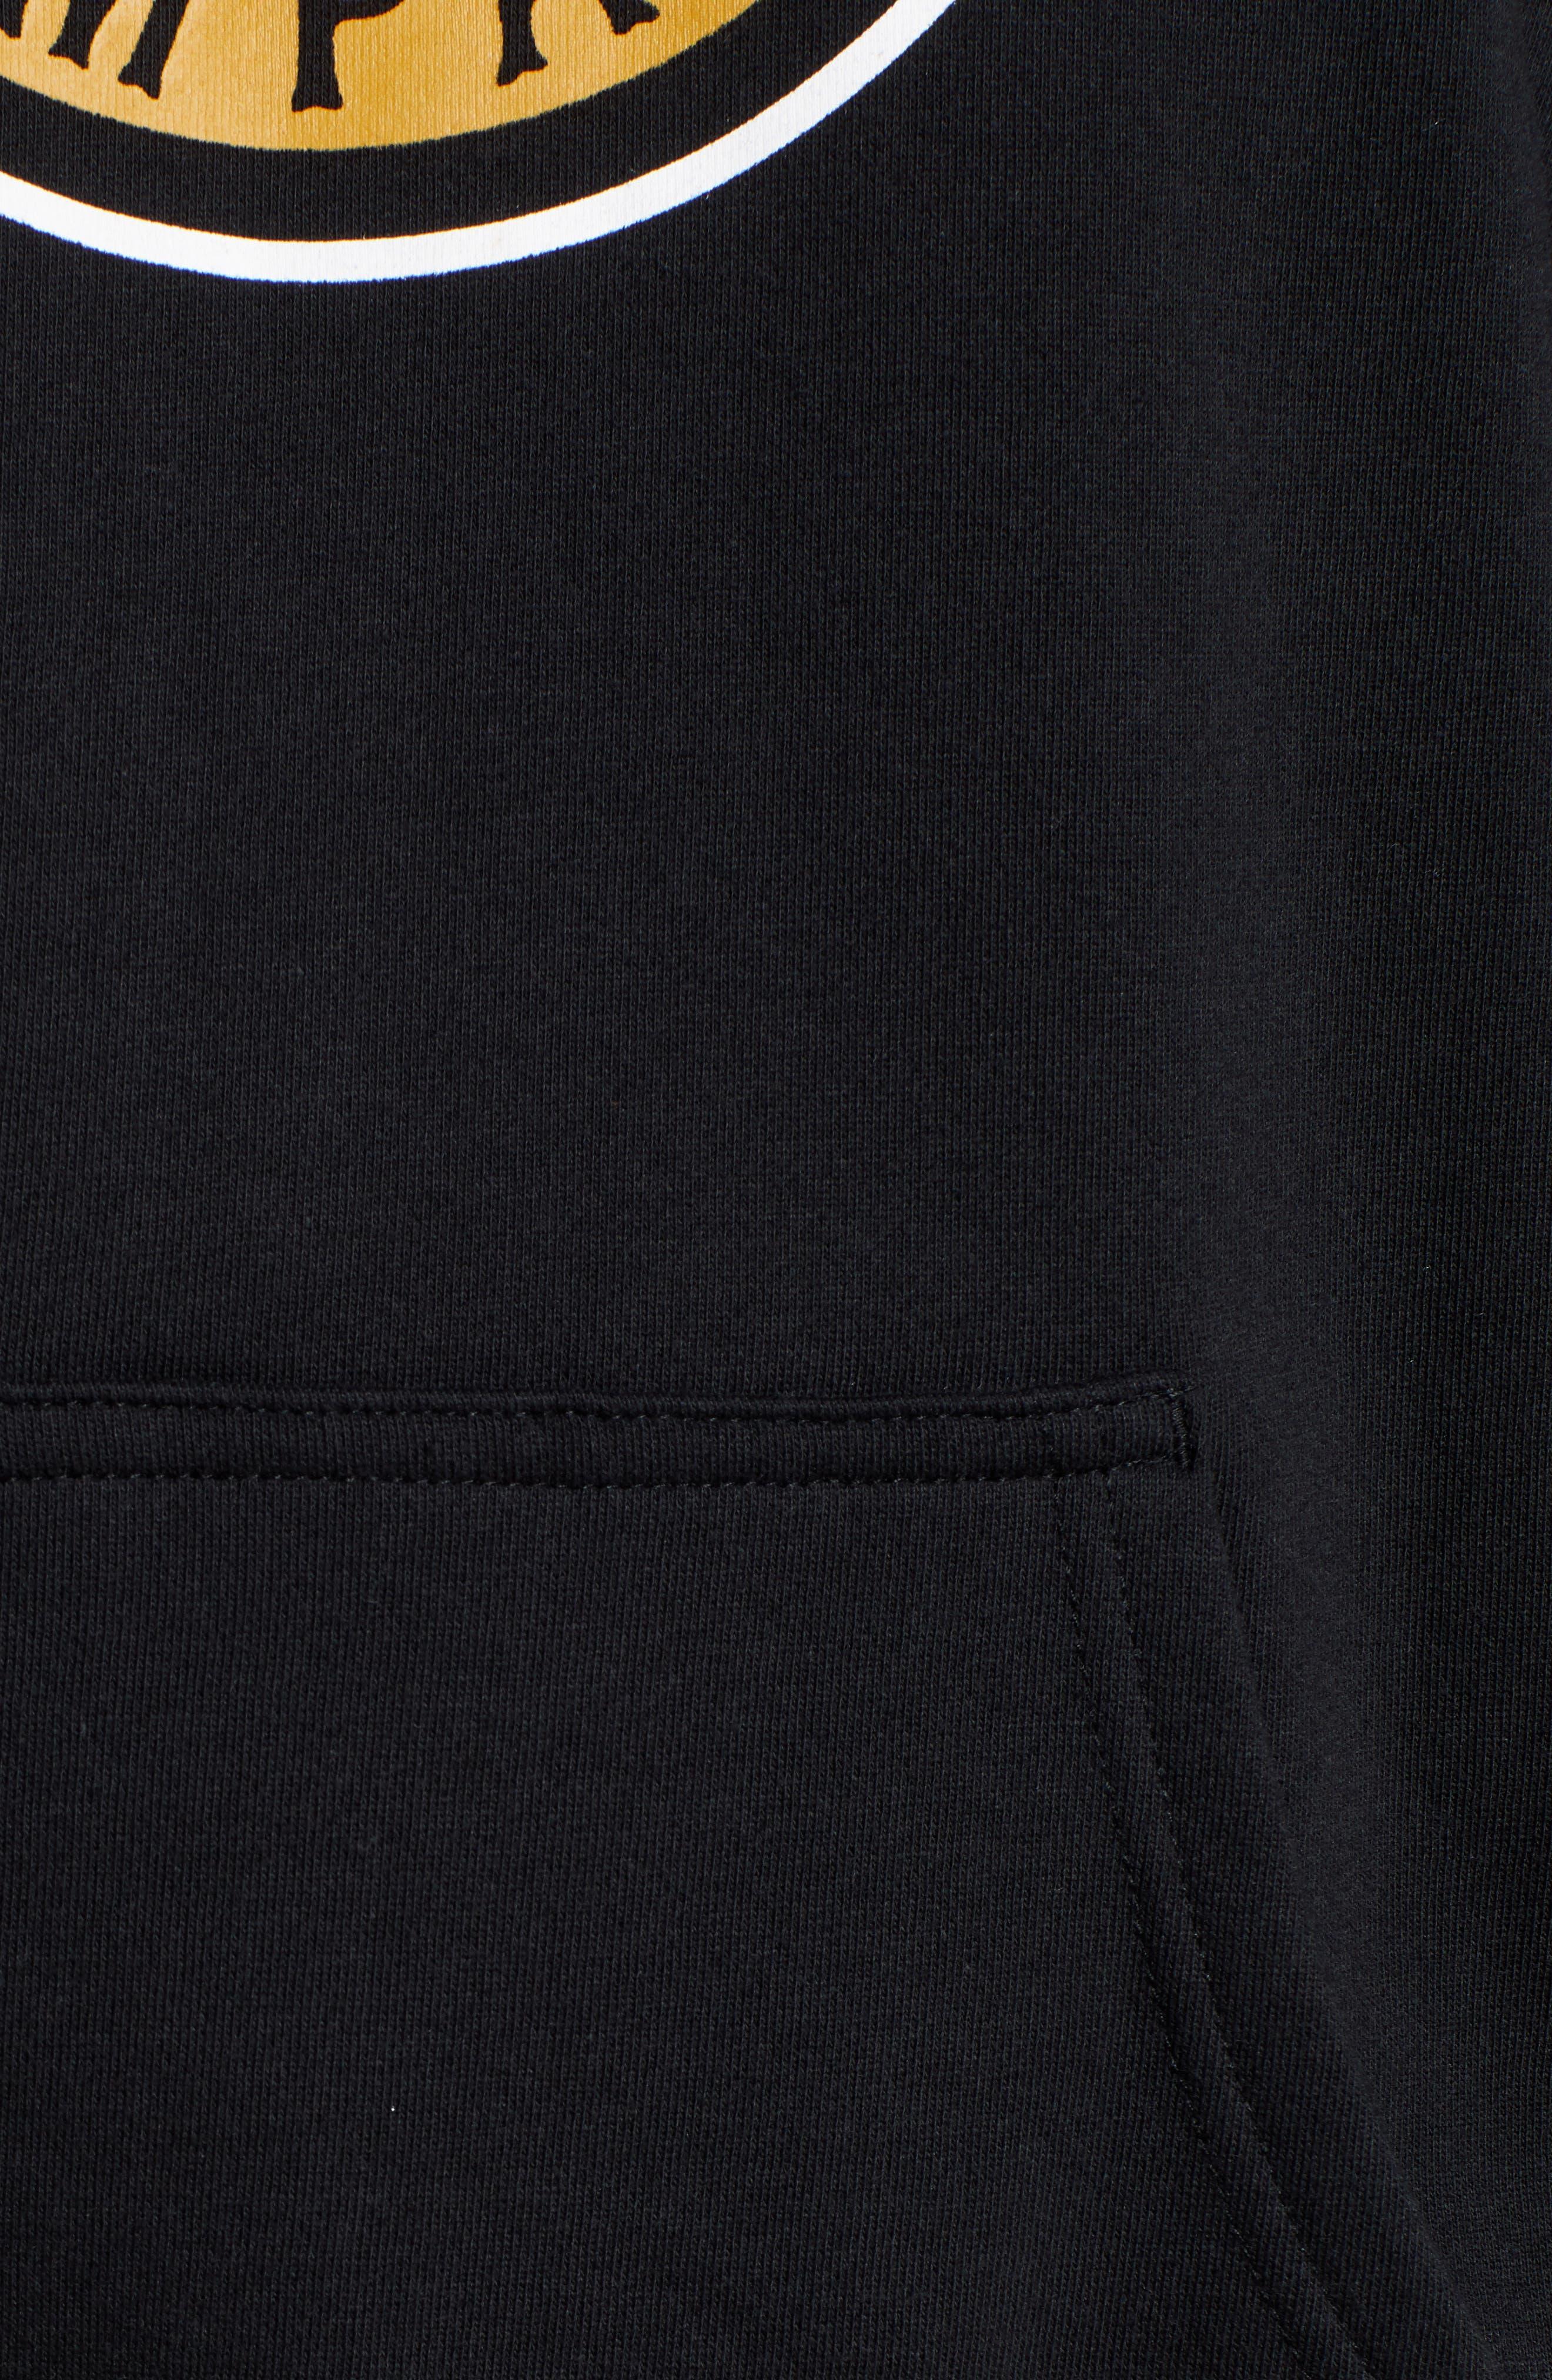 Forte Hooded Sweatshirt,                             Alternate thumbnail 5, color,                             BLACK